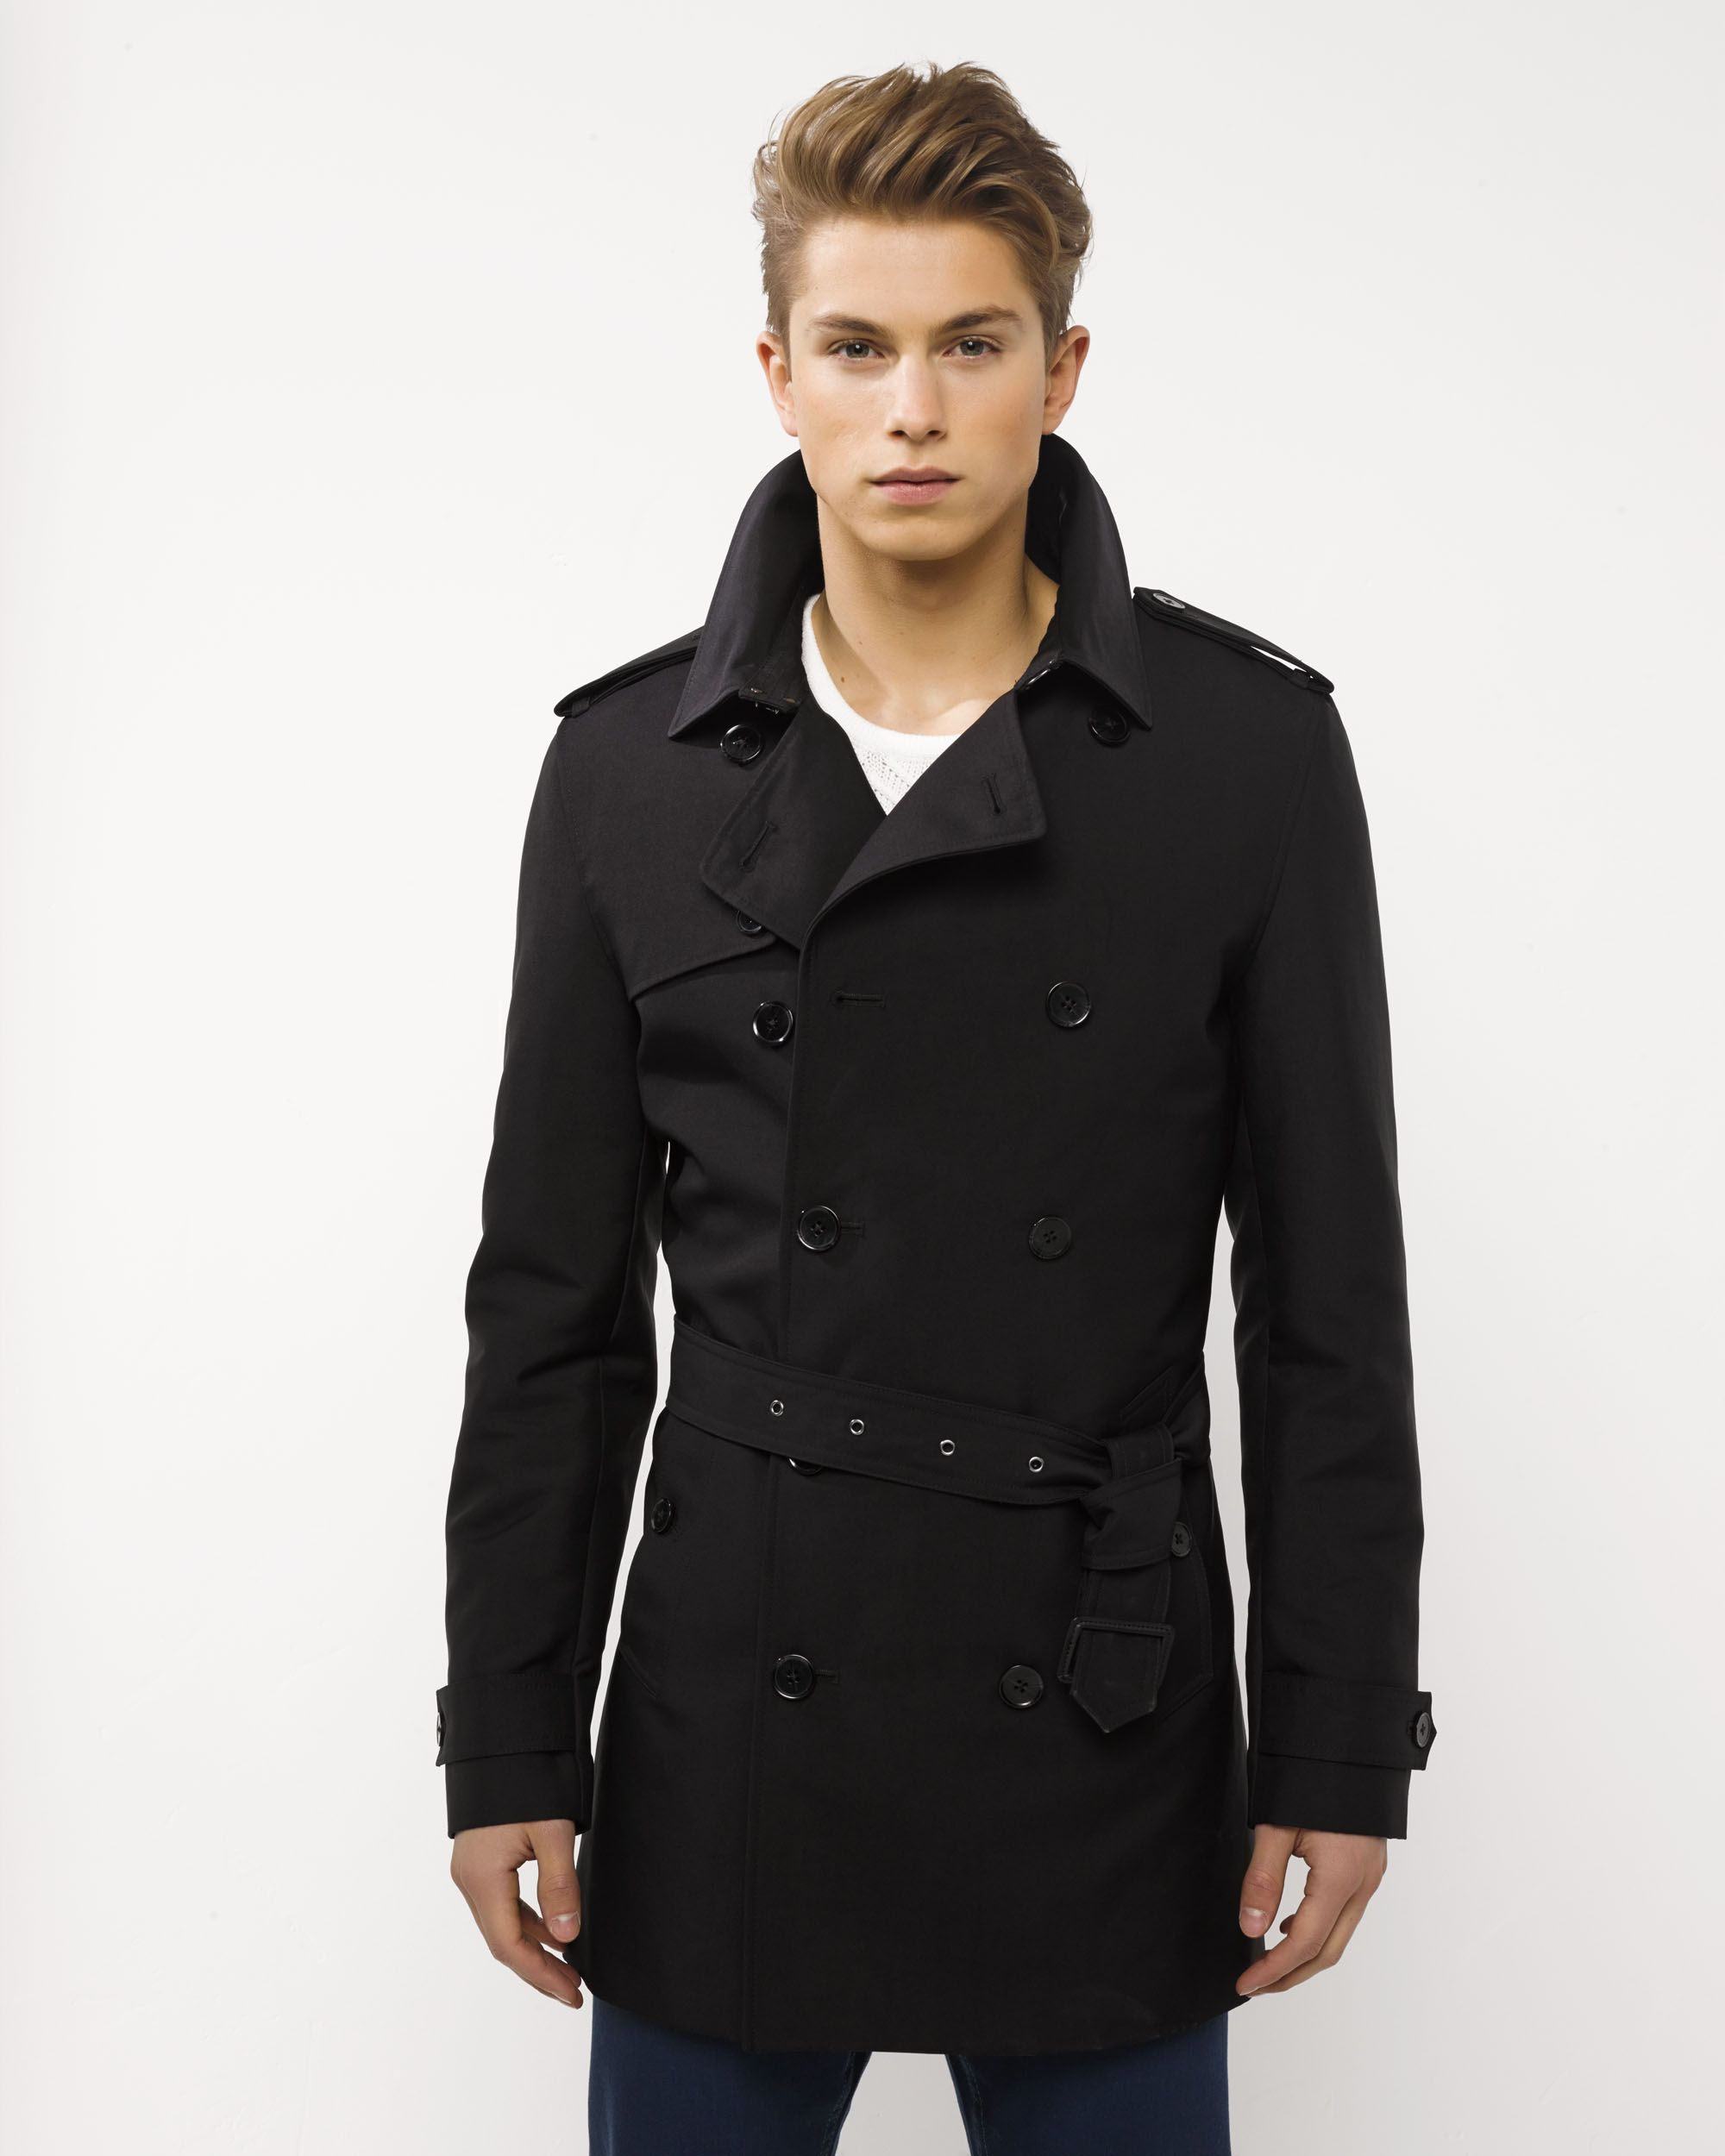 HEREN TRENCHCOAT | 78417717 WE Fashion | Trenchcoat